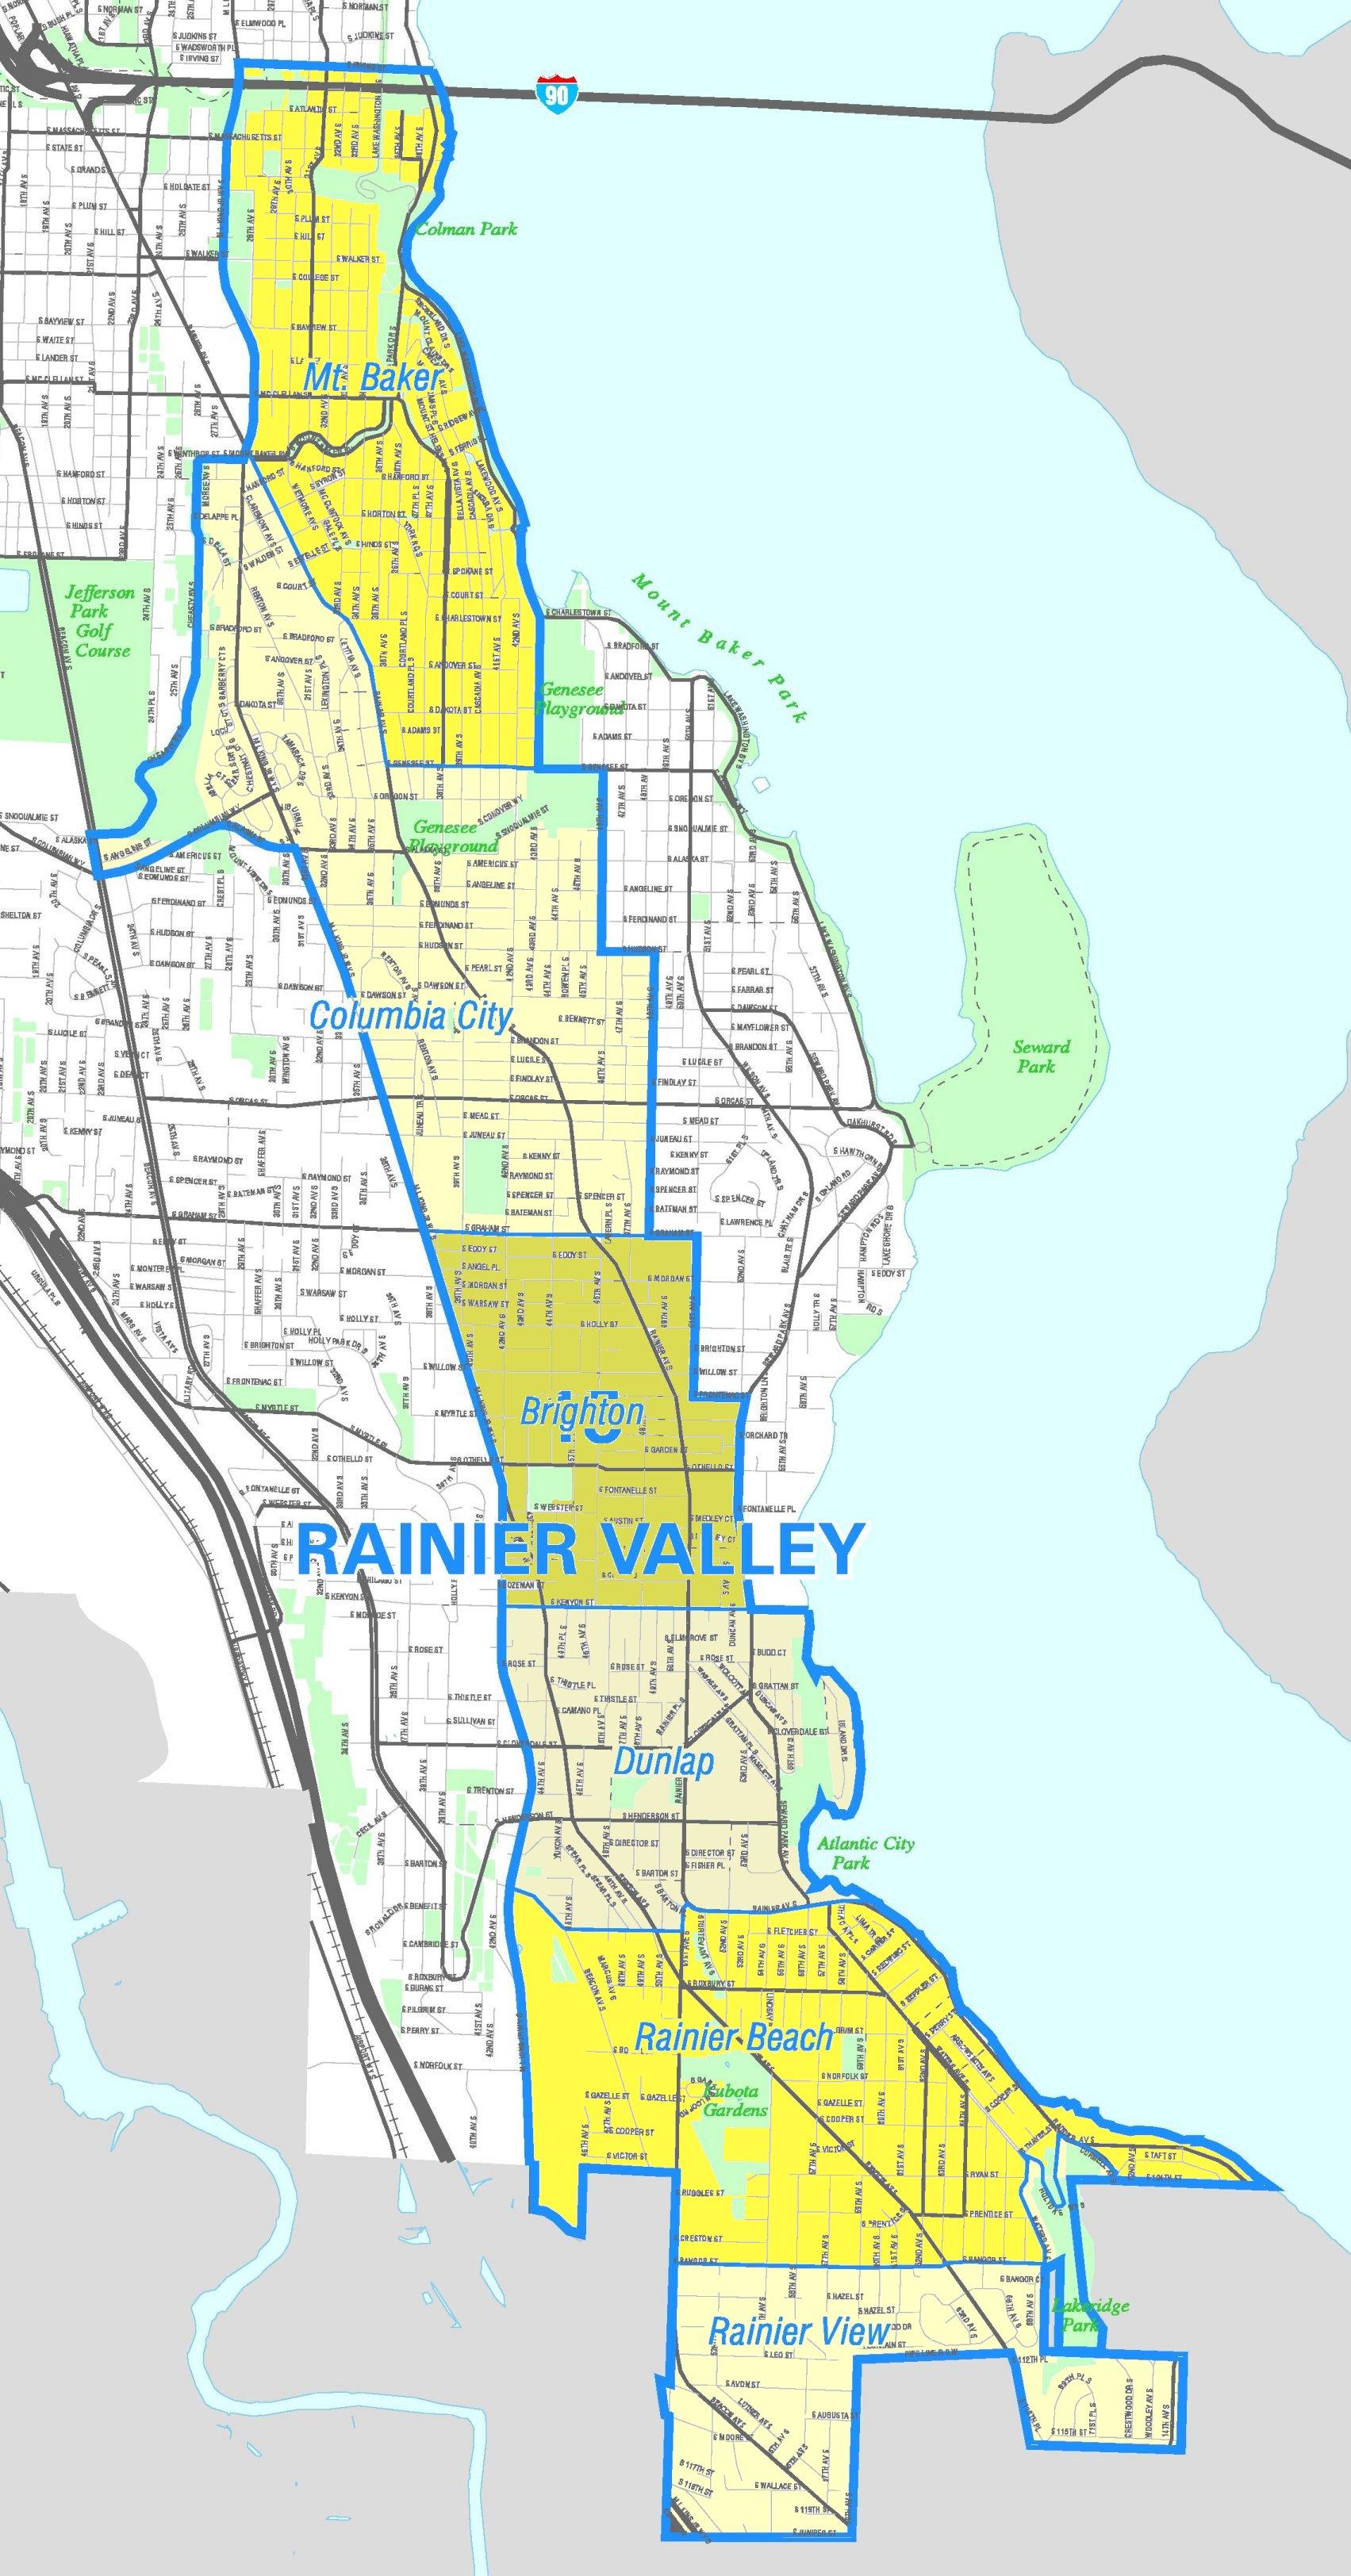 FileSeattle Rainier Valley mapjpg Wikimedia Commons